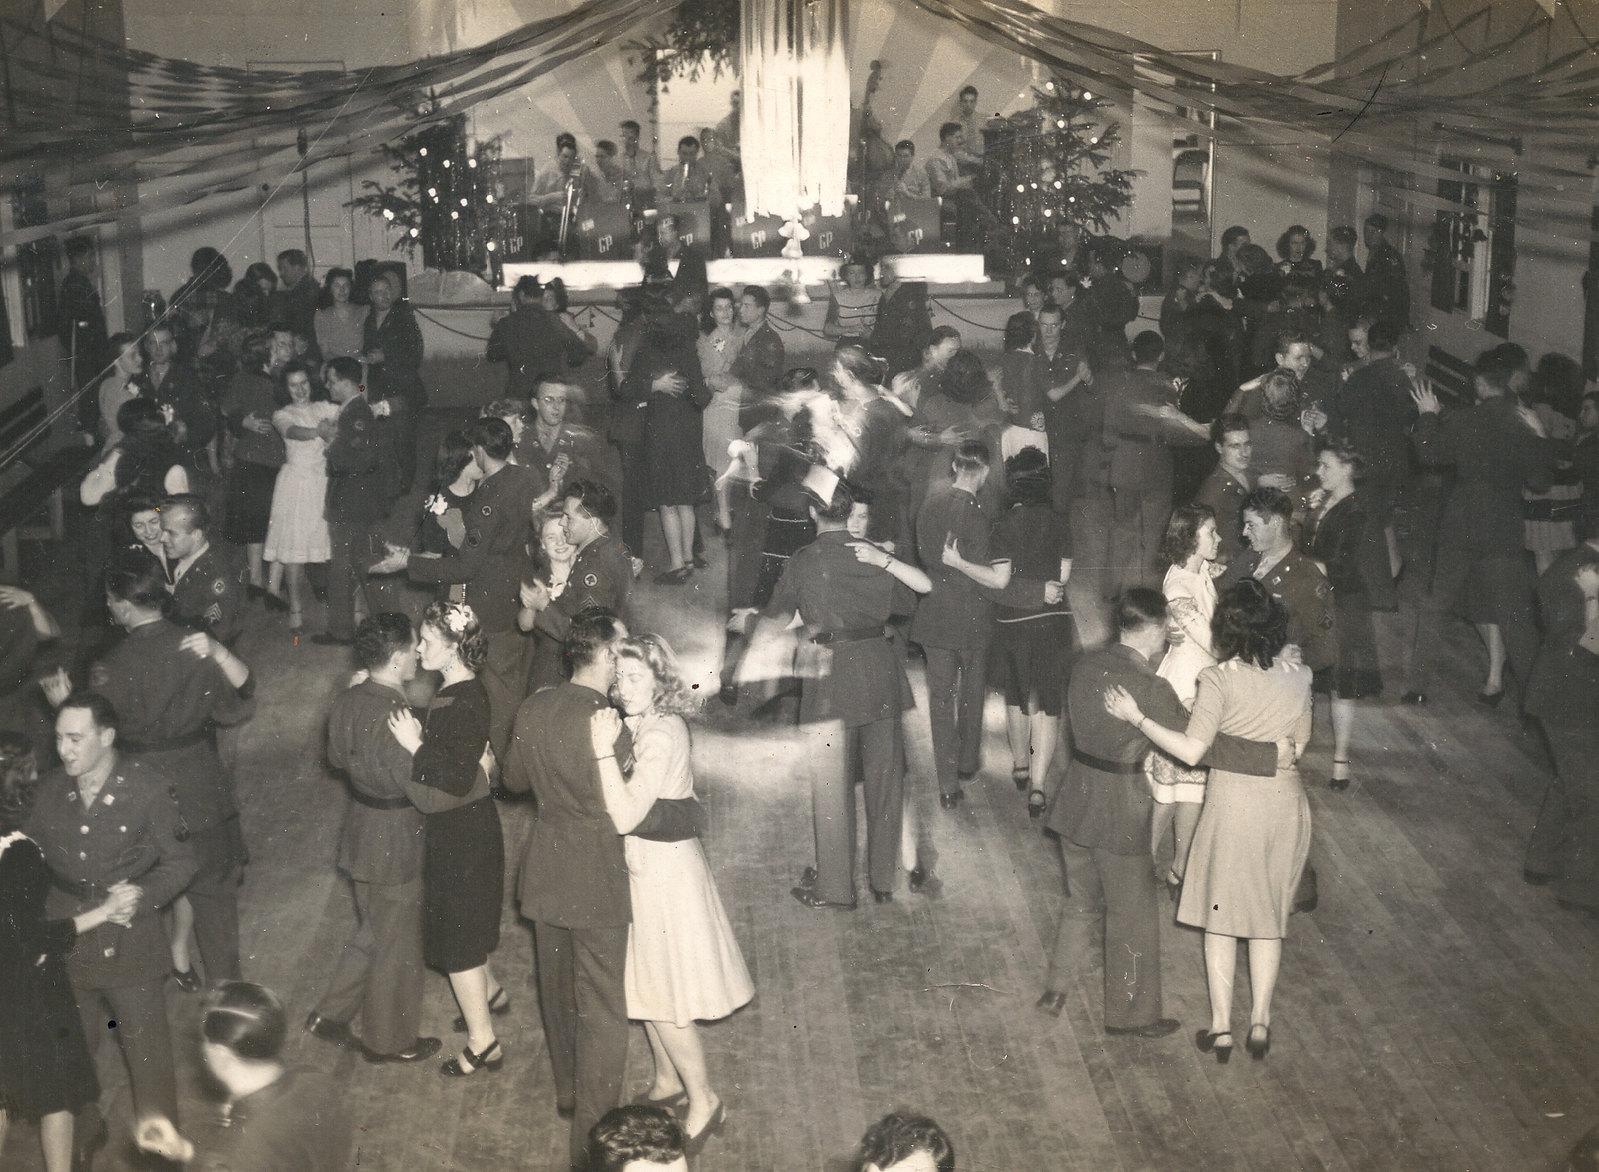 WWII Dance - 1942